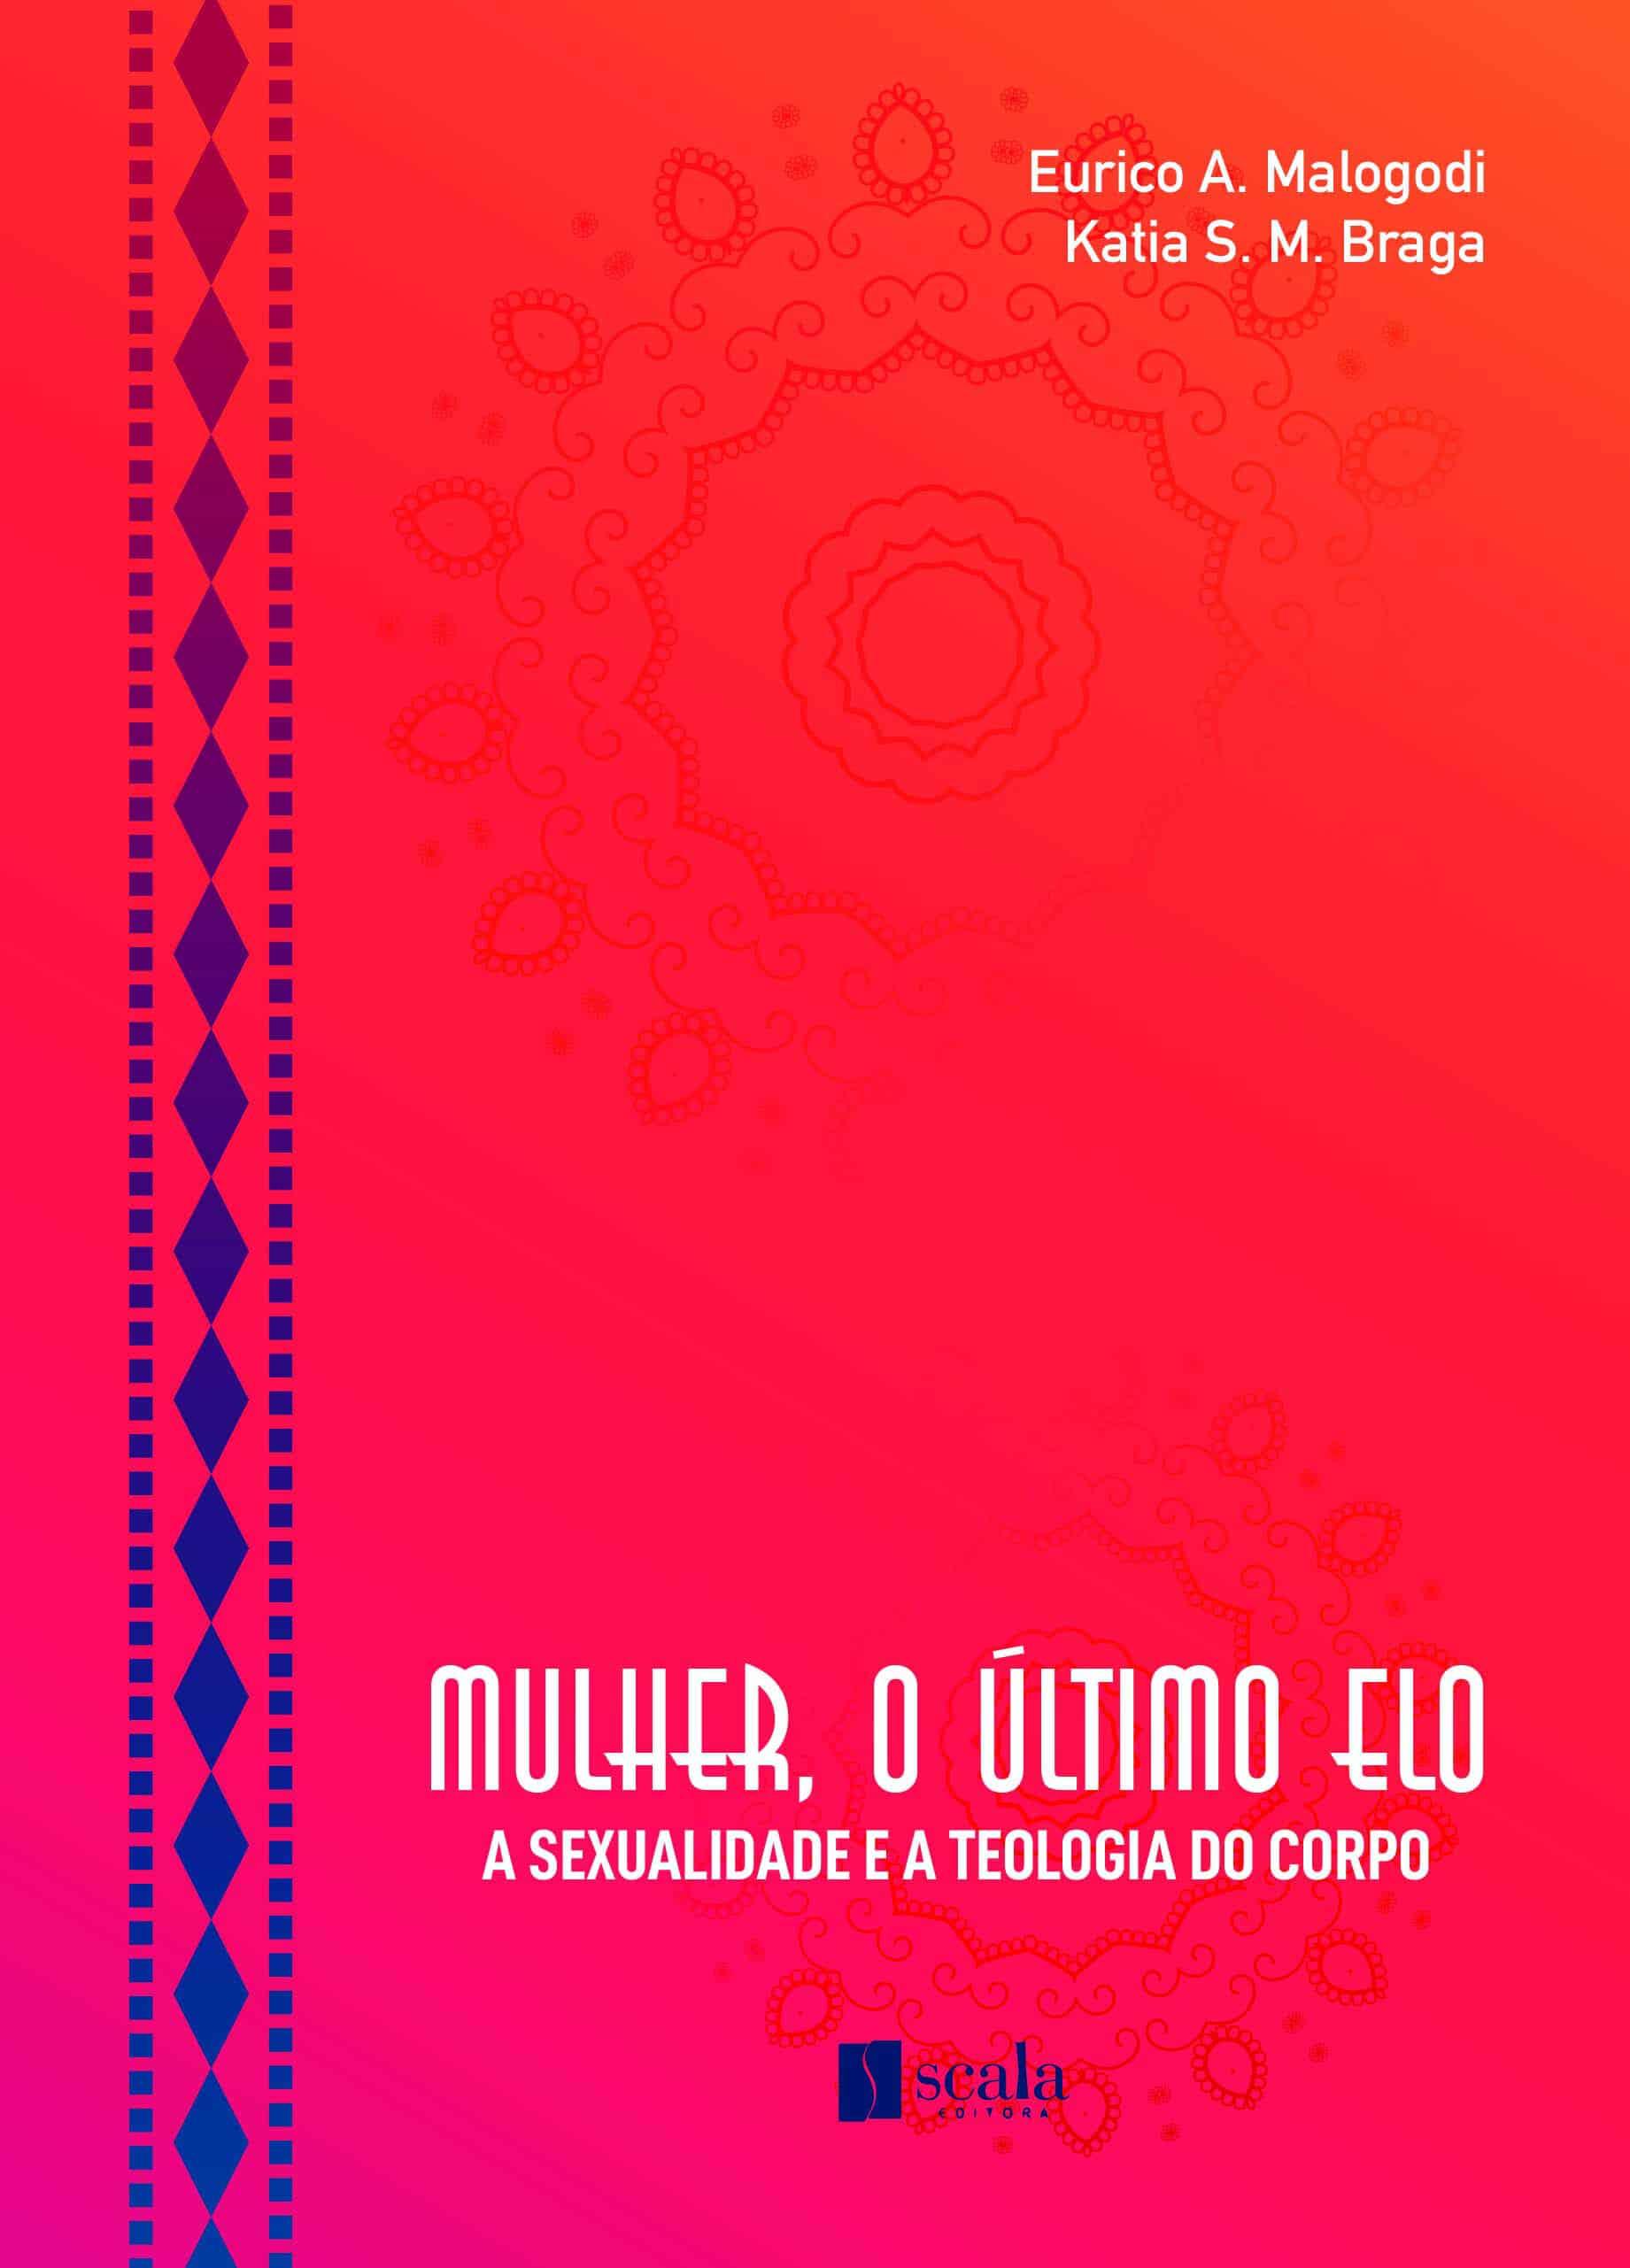 Produto Scala Editora - Livro: Mulher, o último elo – A sexualidade e a teologia do corpo - Familiar